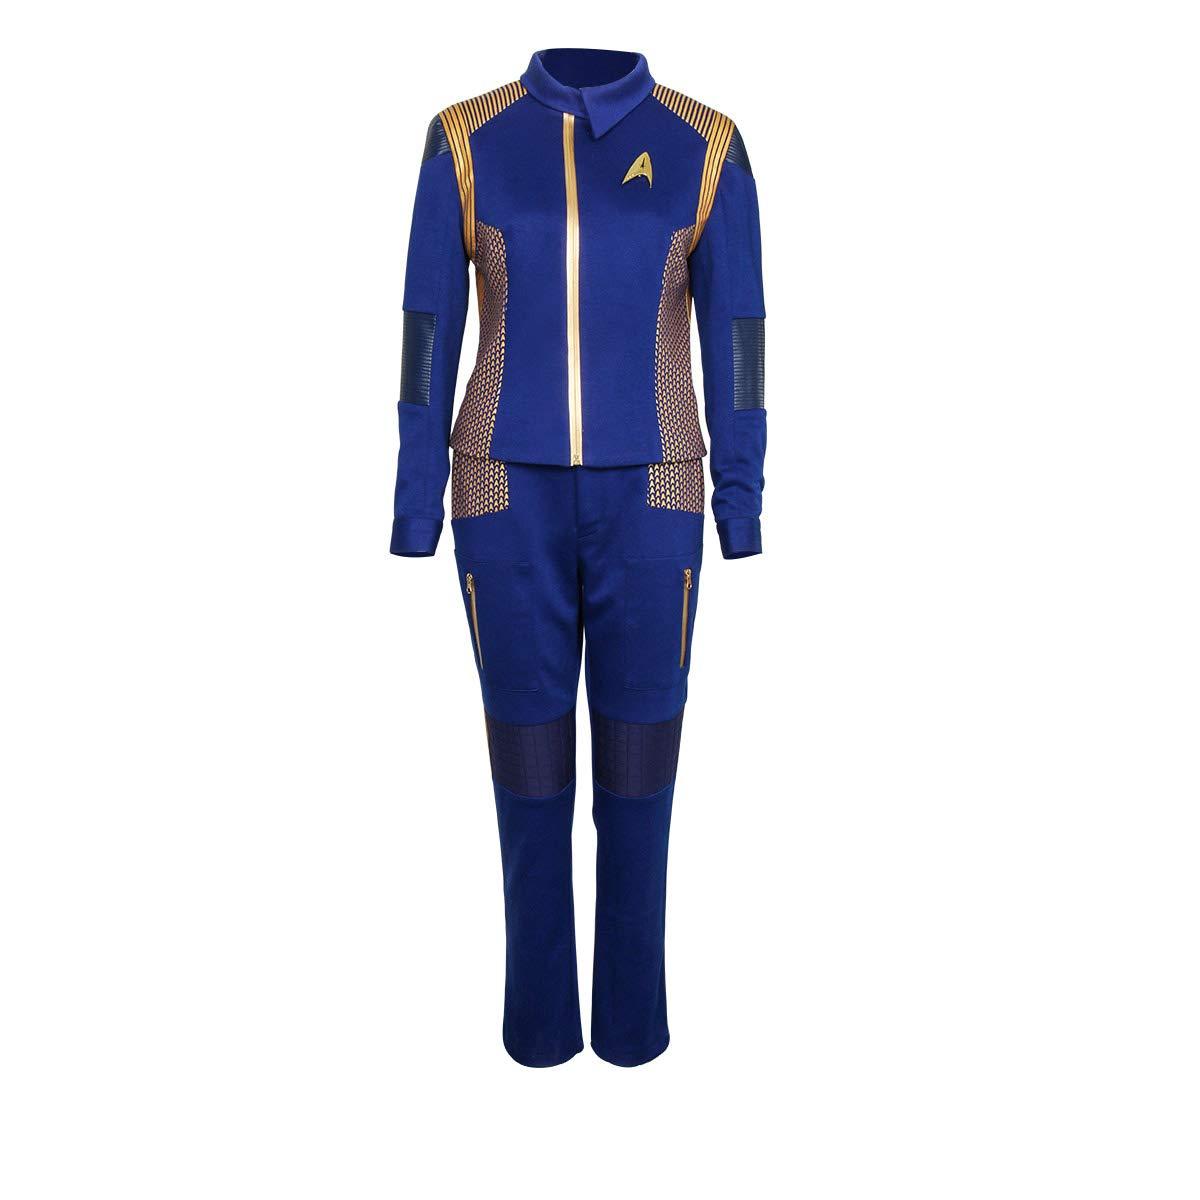 Partyever Trek Discovery Commander Uniform 2017 New Starfleet USS Discovery Captain Lorca Cosplay Costume Halloween Outfit (Large, Women)